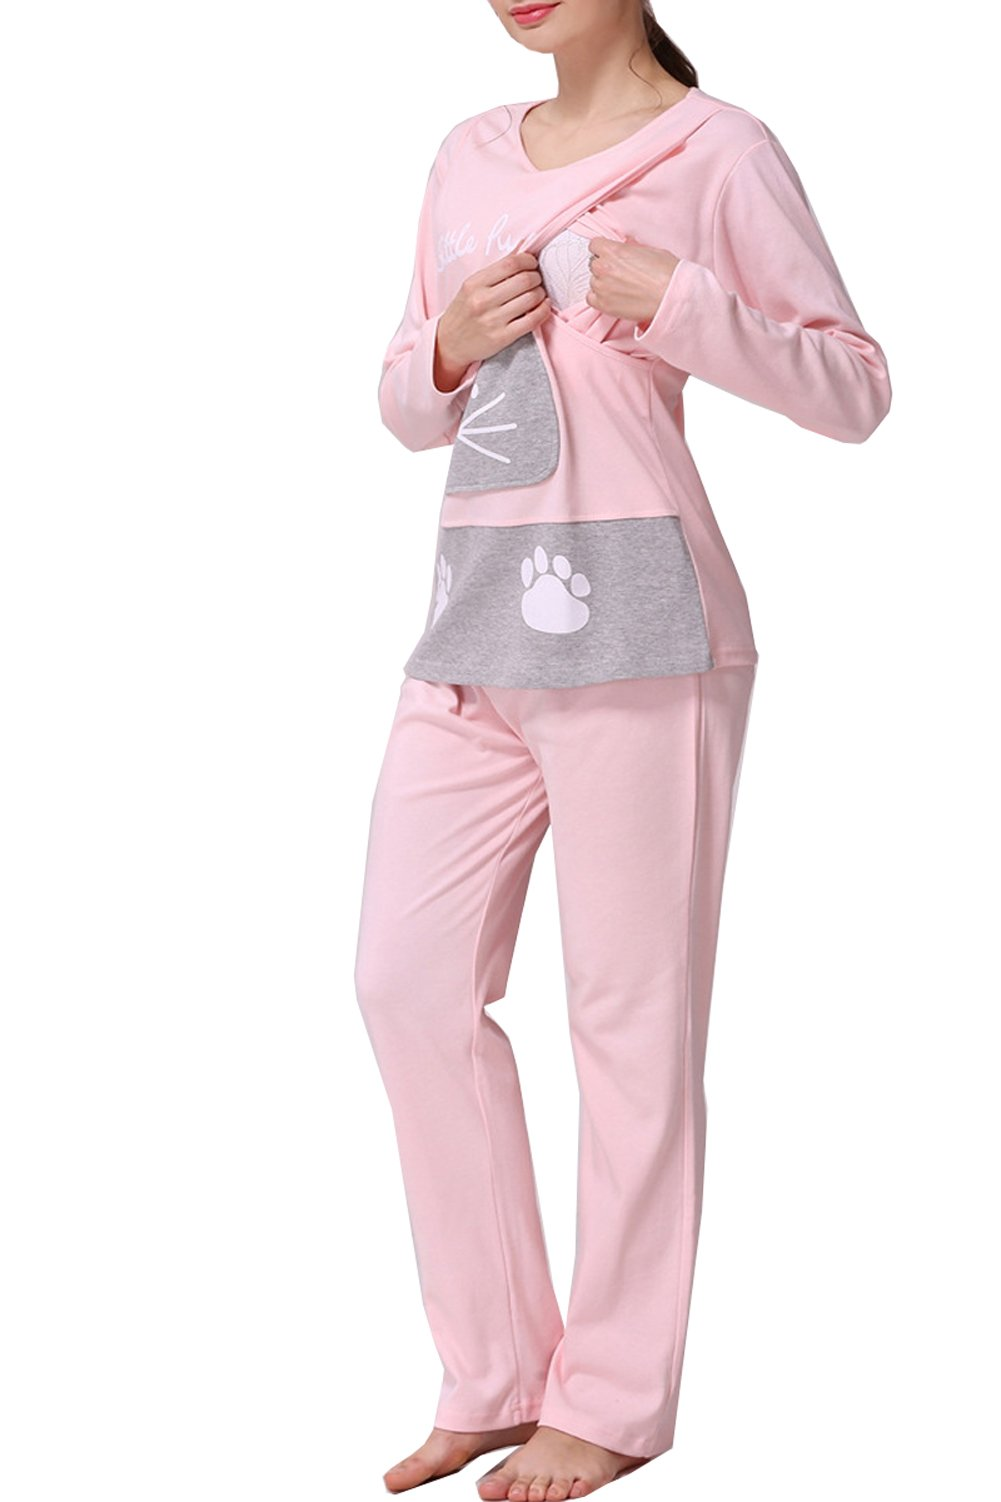 Women's Cat Pattern Maternity Nursing Pajamas Set Breastfeeding Top and Pant (Medium, Pink)